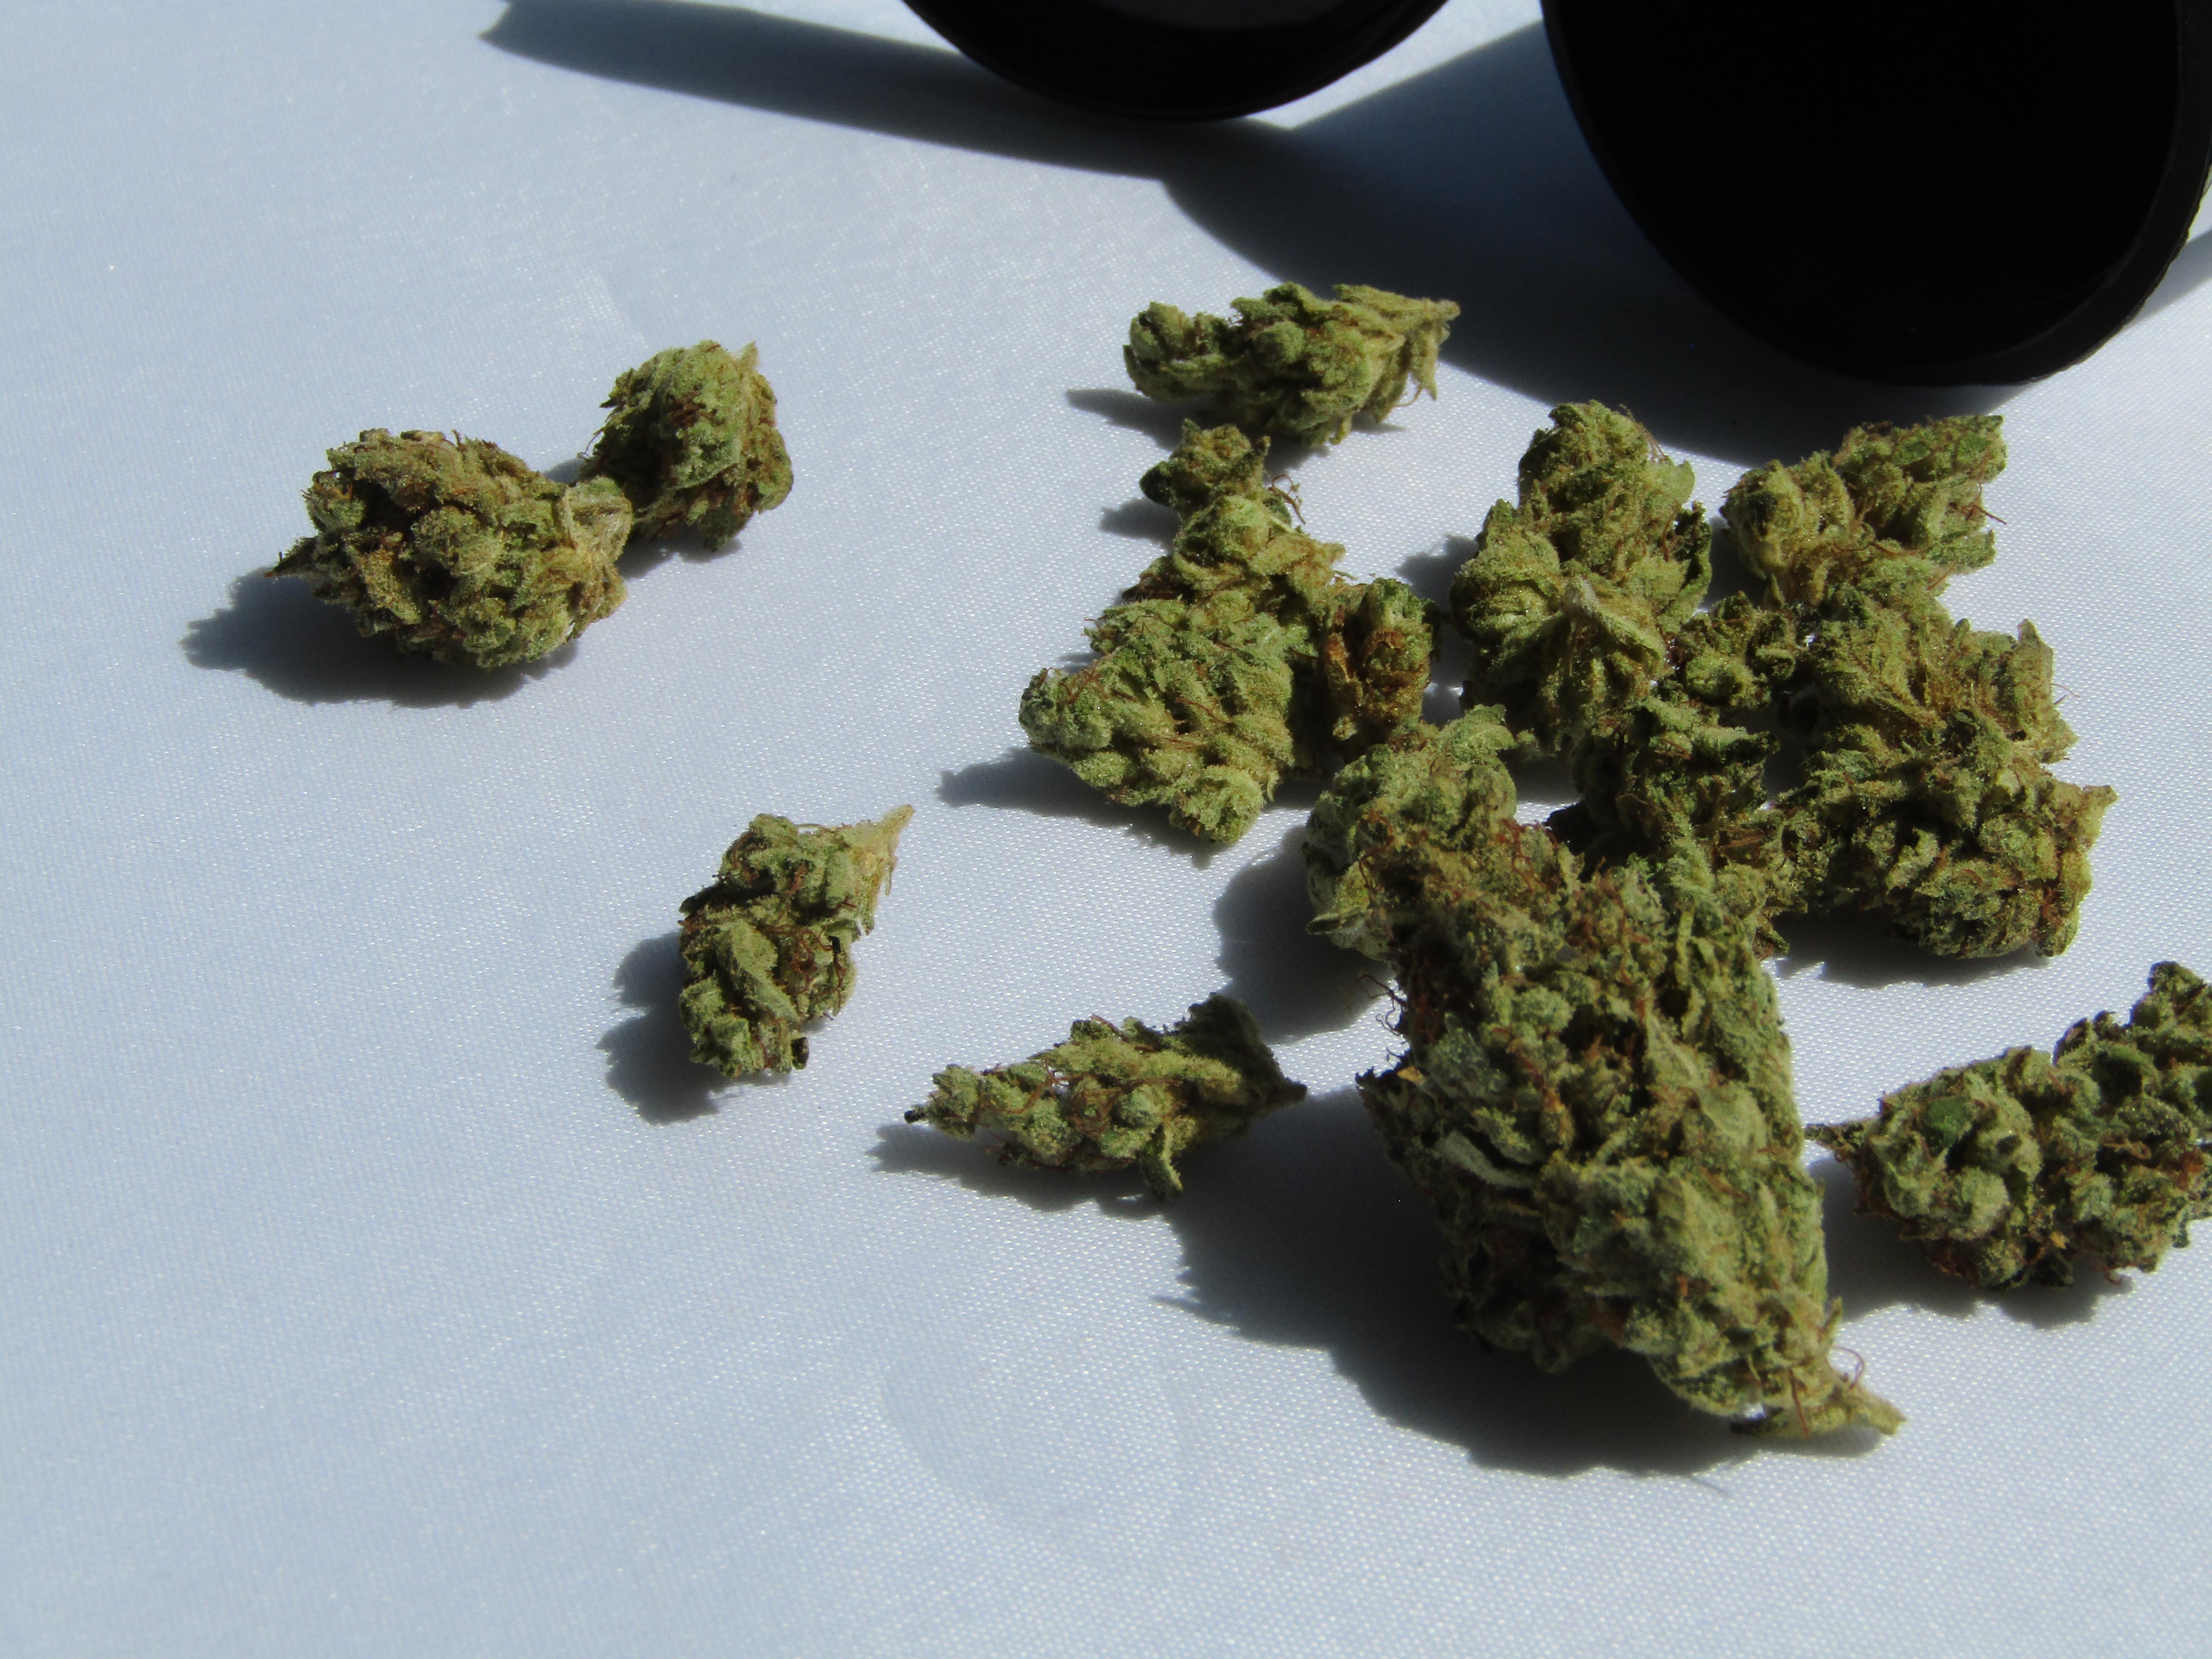 marijuana soil